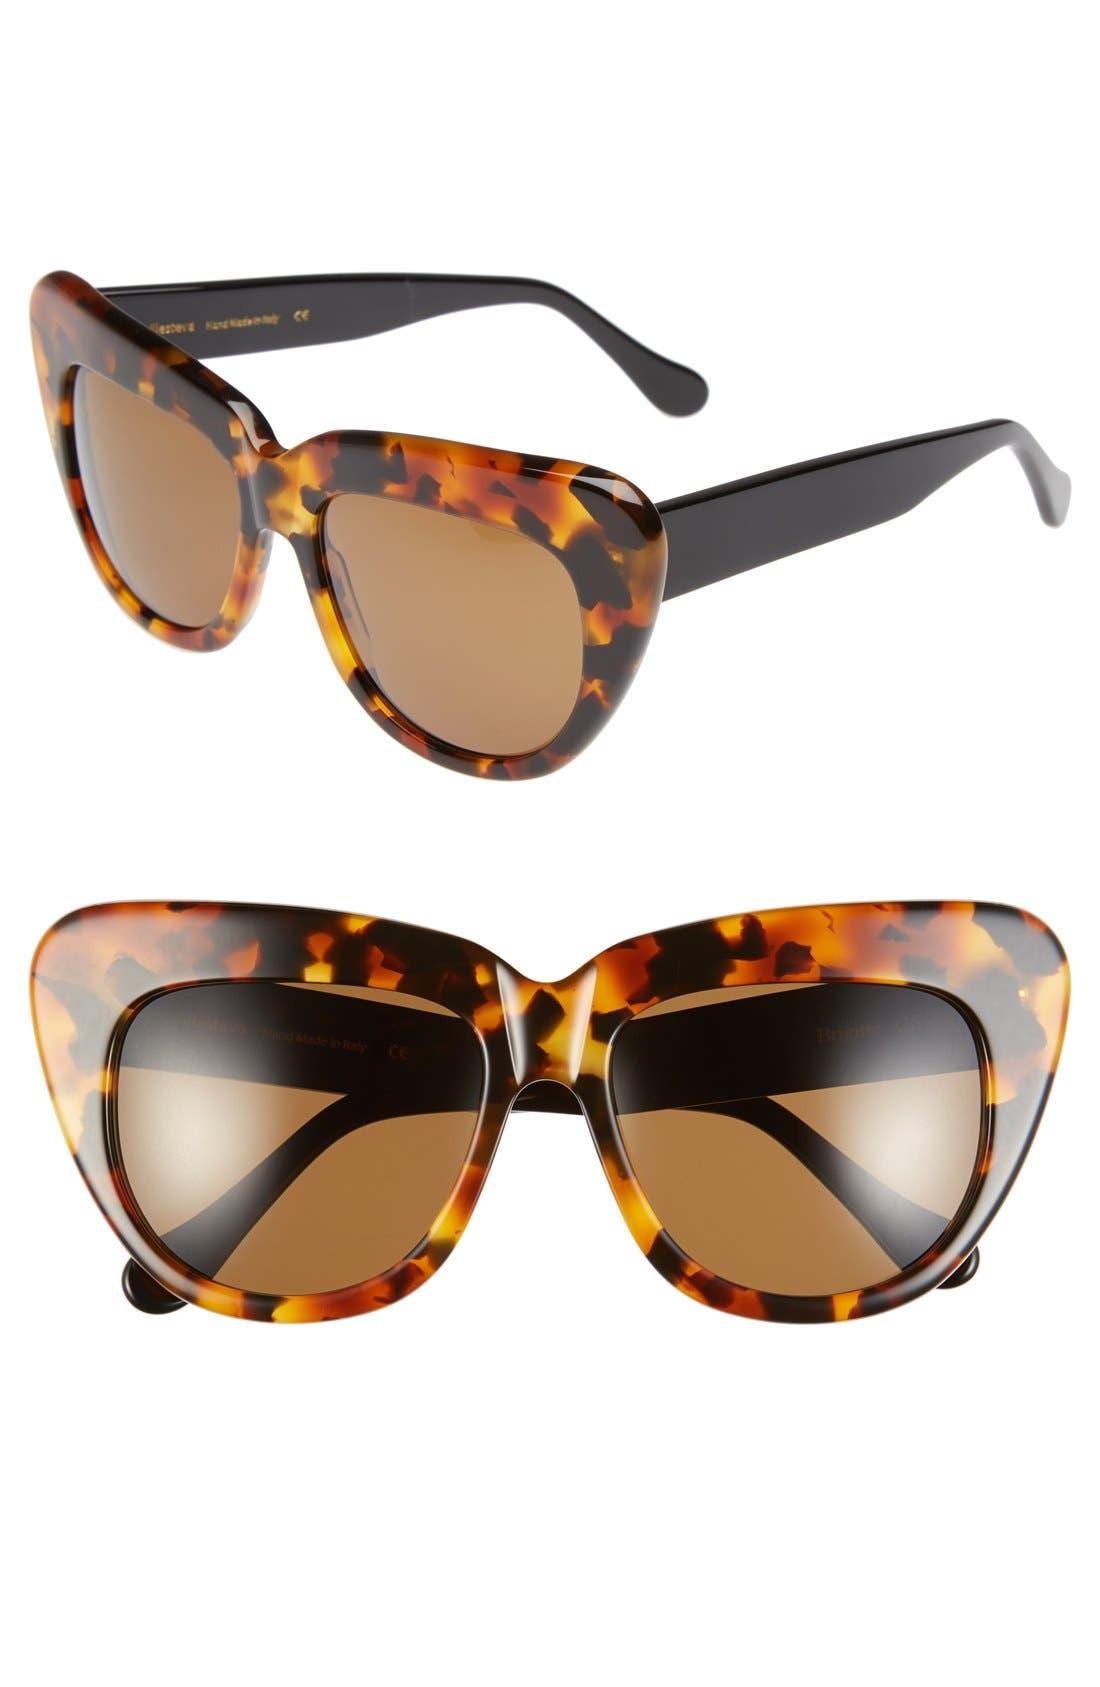 Alternate Image 1 Selected - Illesteva 'Brigitte' 55mm Retro Sunglasses